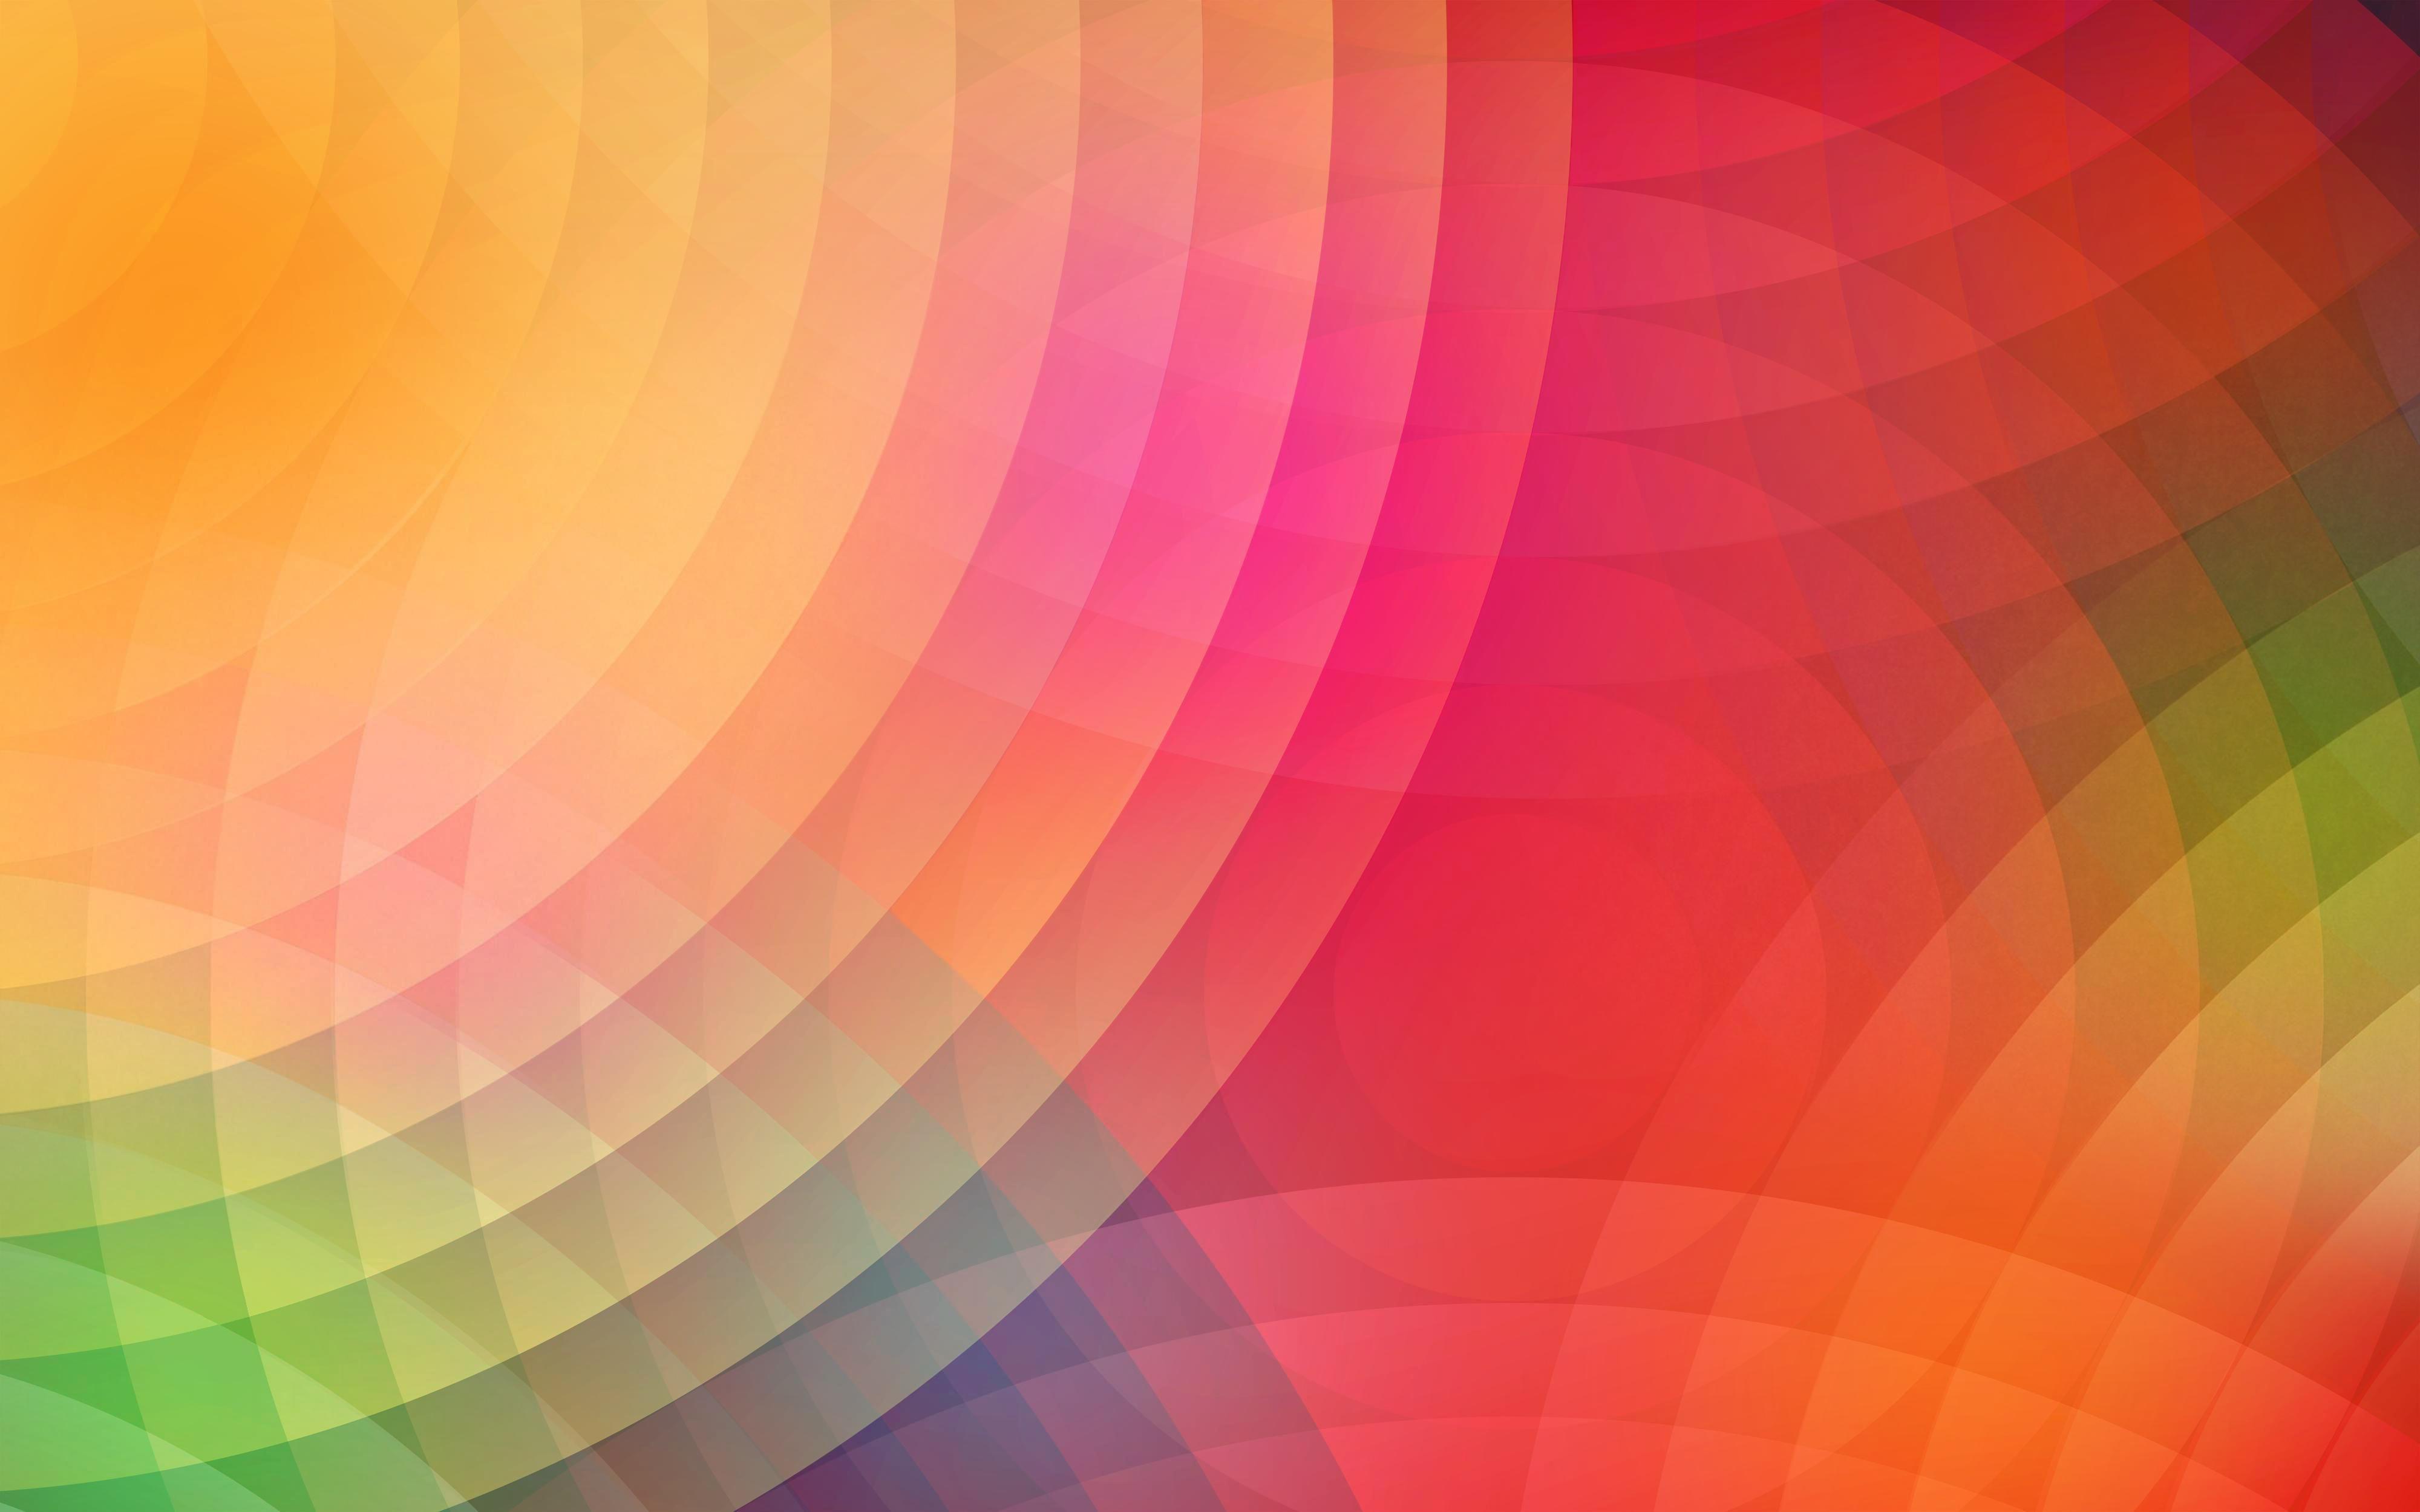 Hd wallpaper xda - Nexus P Wallpaper Huawei Nexus P Pinterest Wallpapers